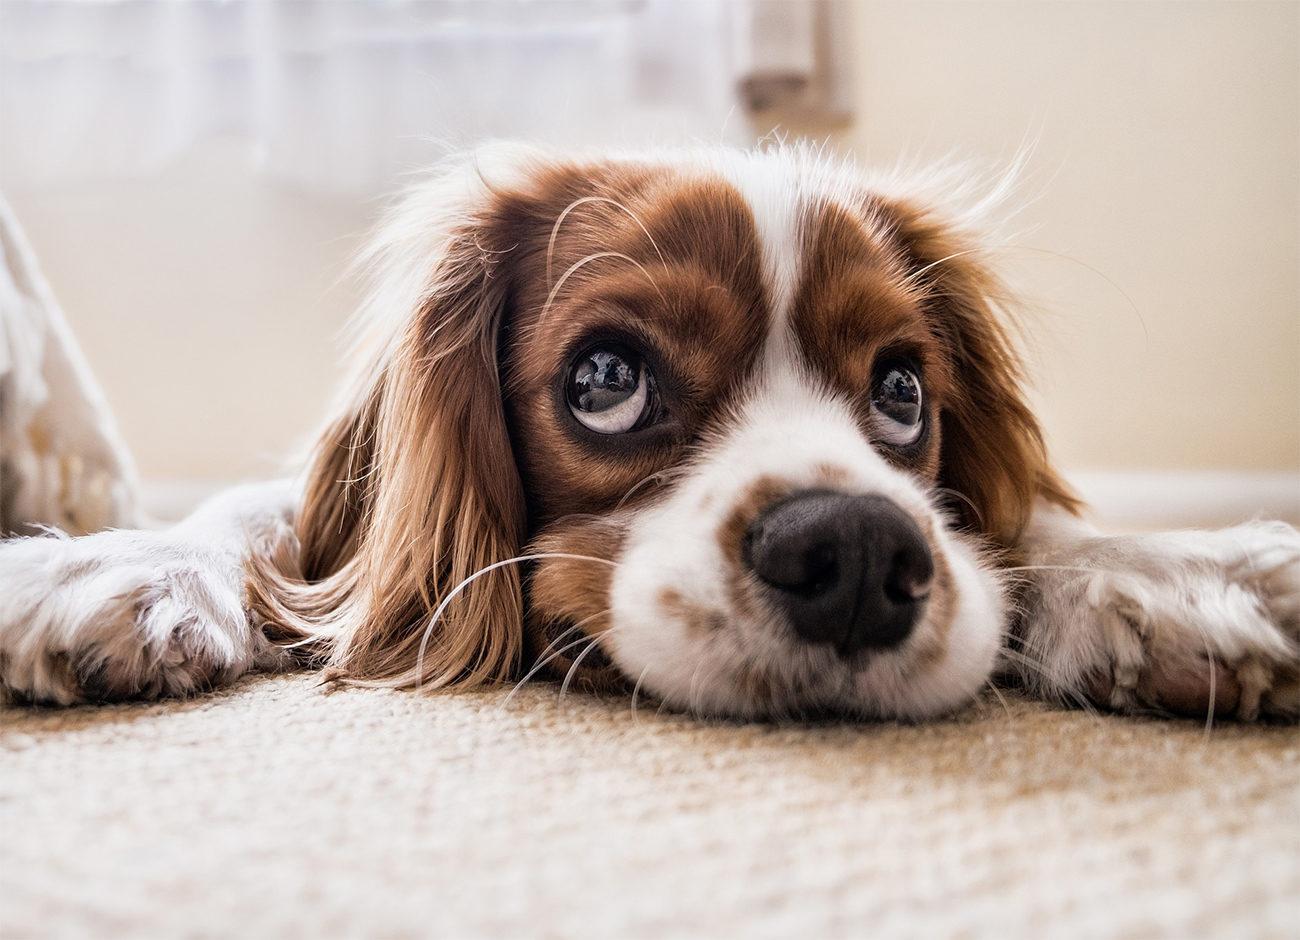 Dog with sad eyes laying on the carpet